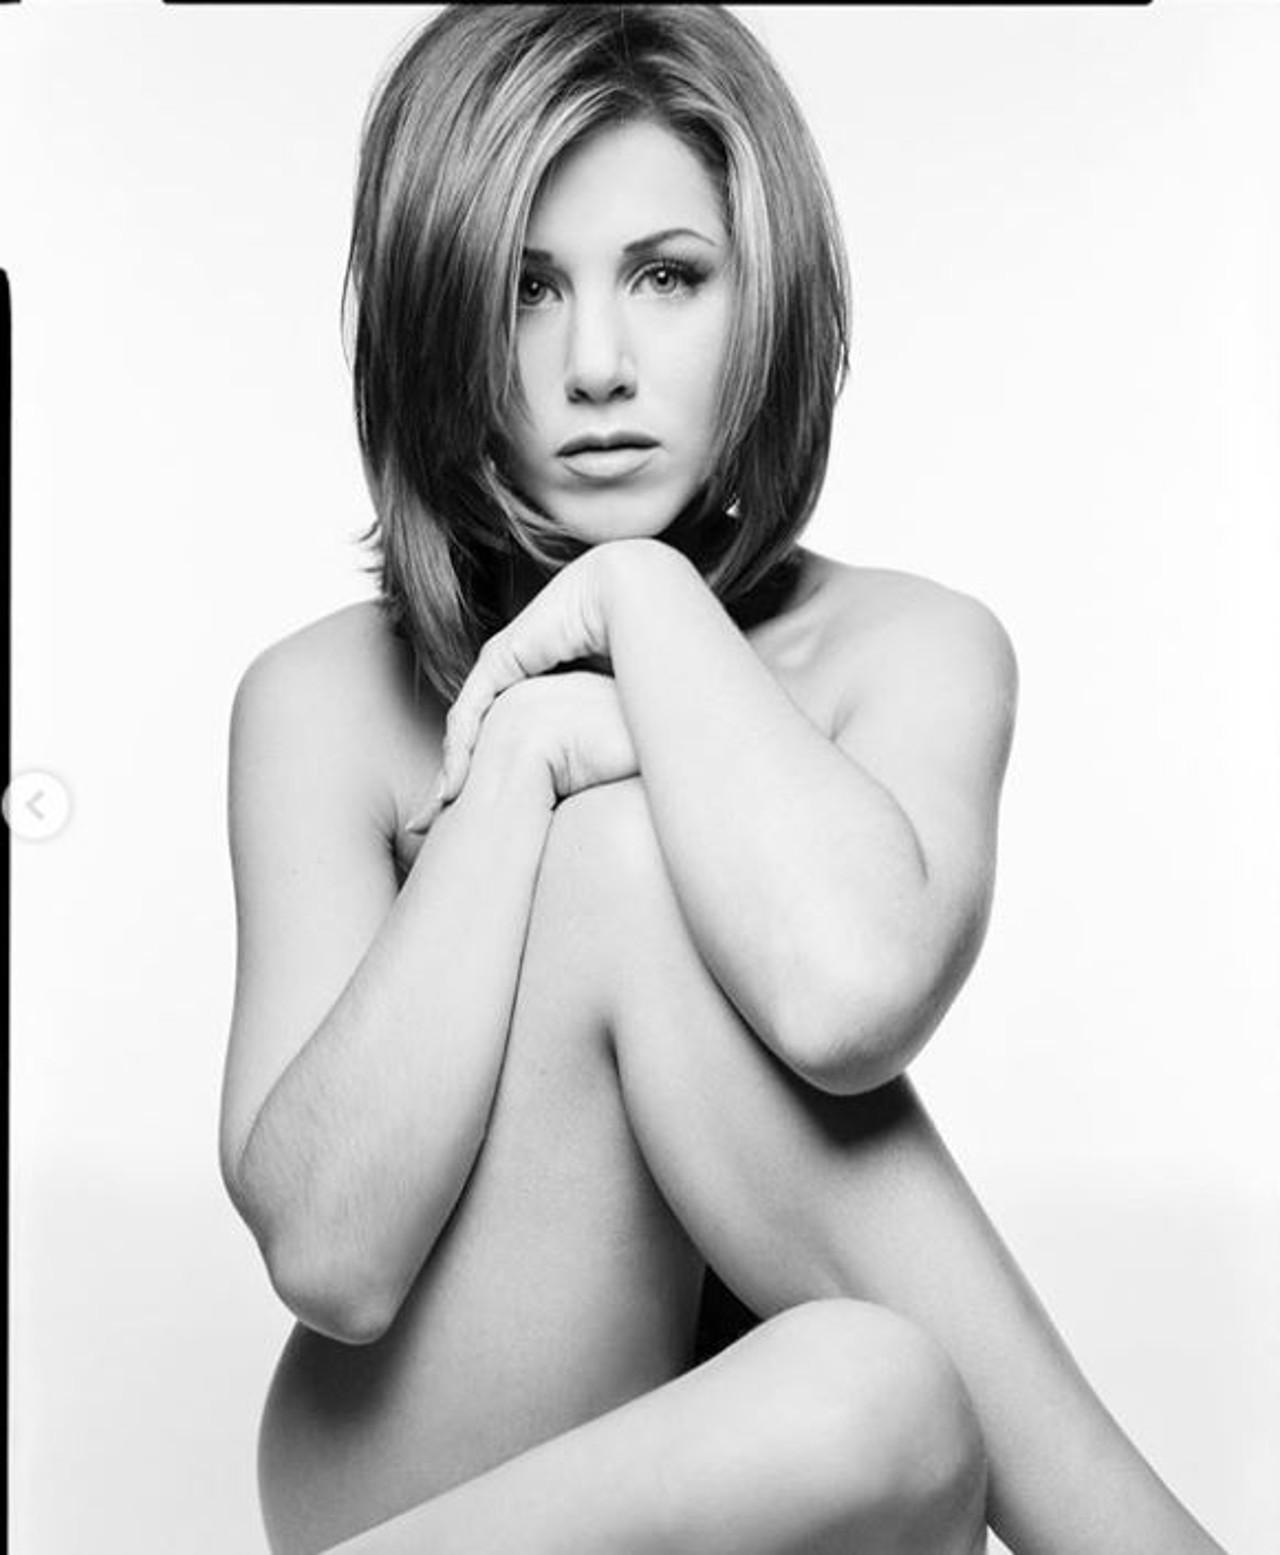 Naga Jennifer Lopez w wieku 26 lat.